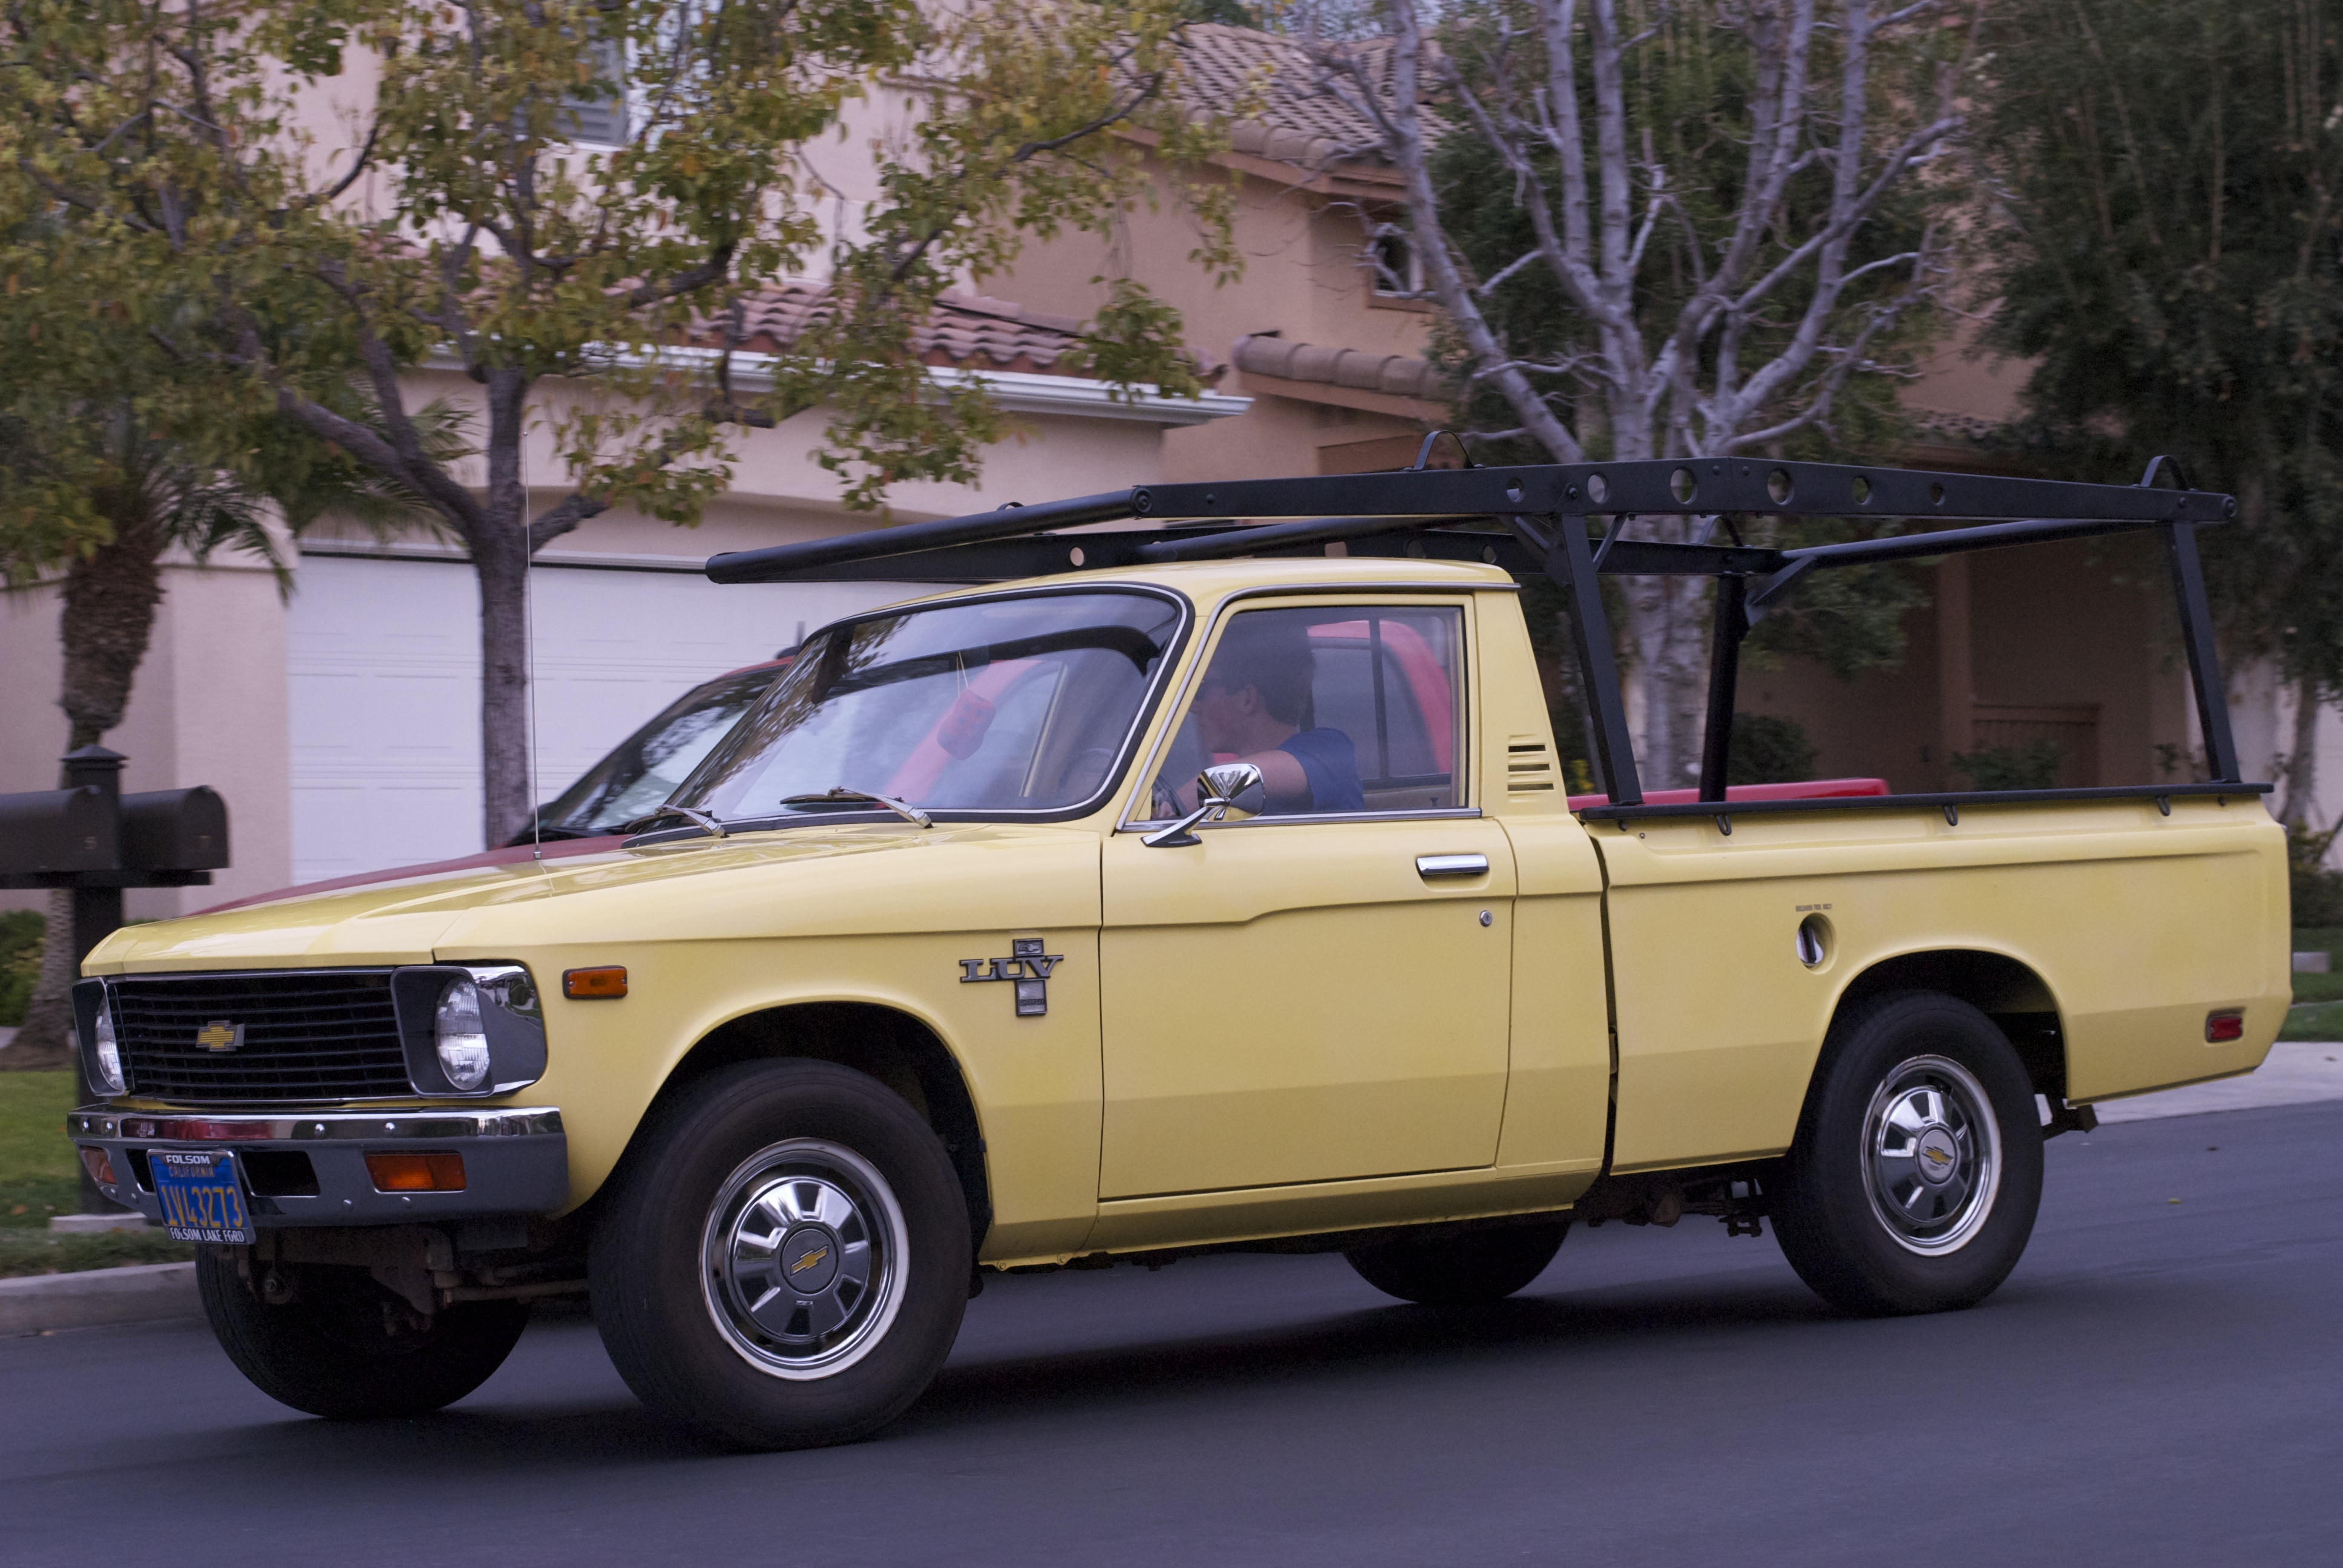 1980 Chevrolet Luv Light Utility Vehicle Chevy Pickup Truck